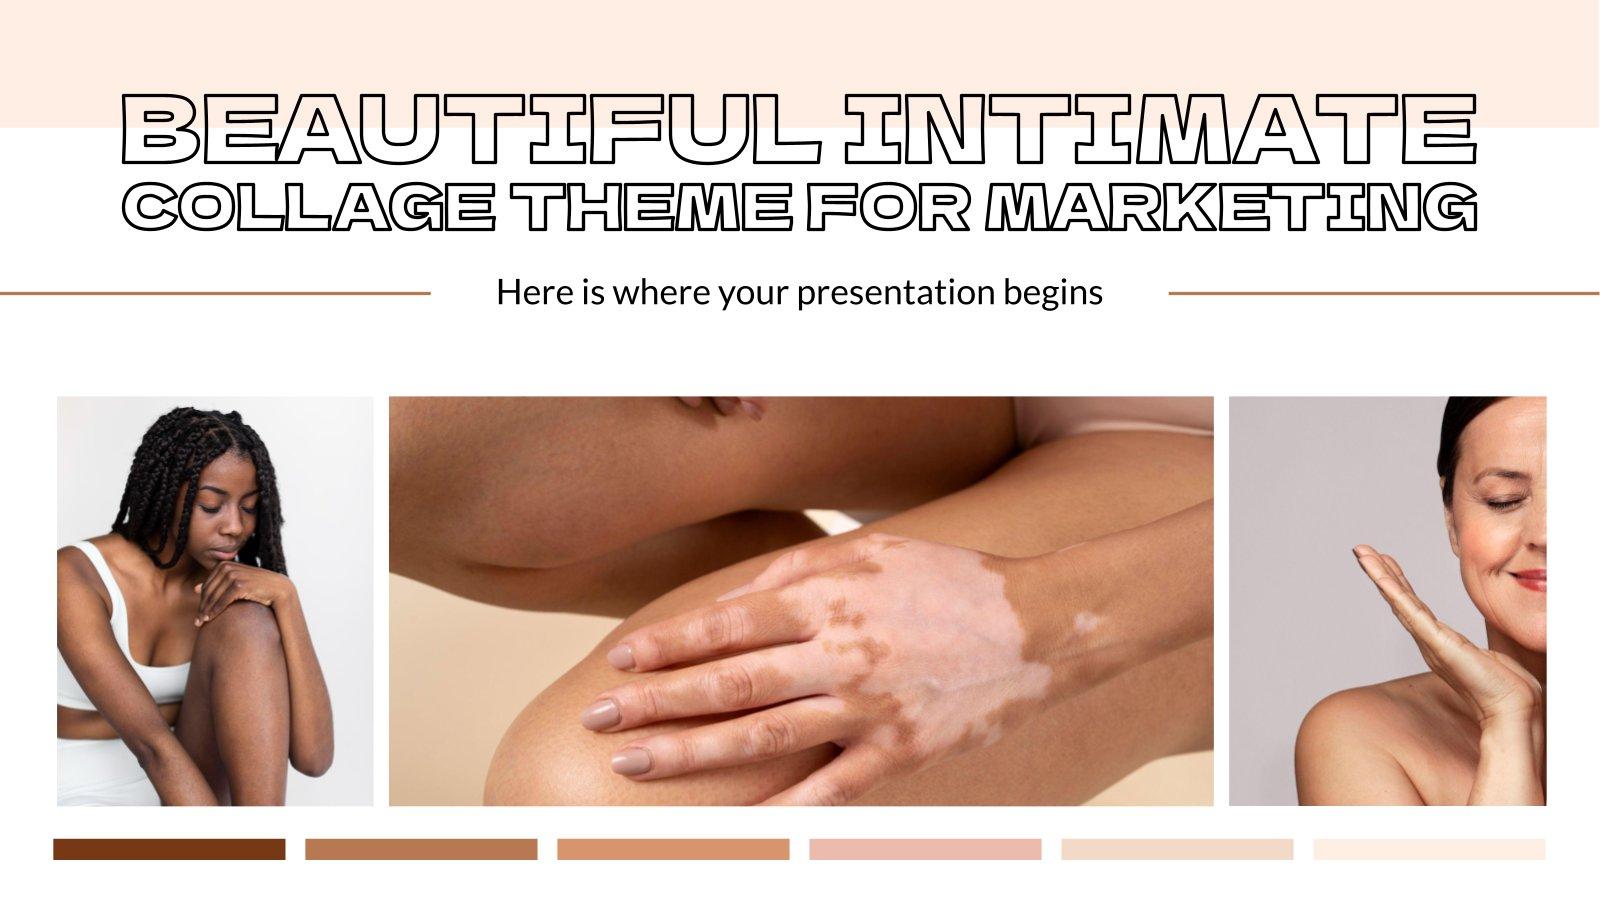 Plantilla de presentación Tema para marketing con collages sobre belleza